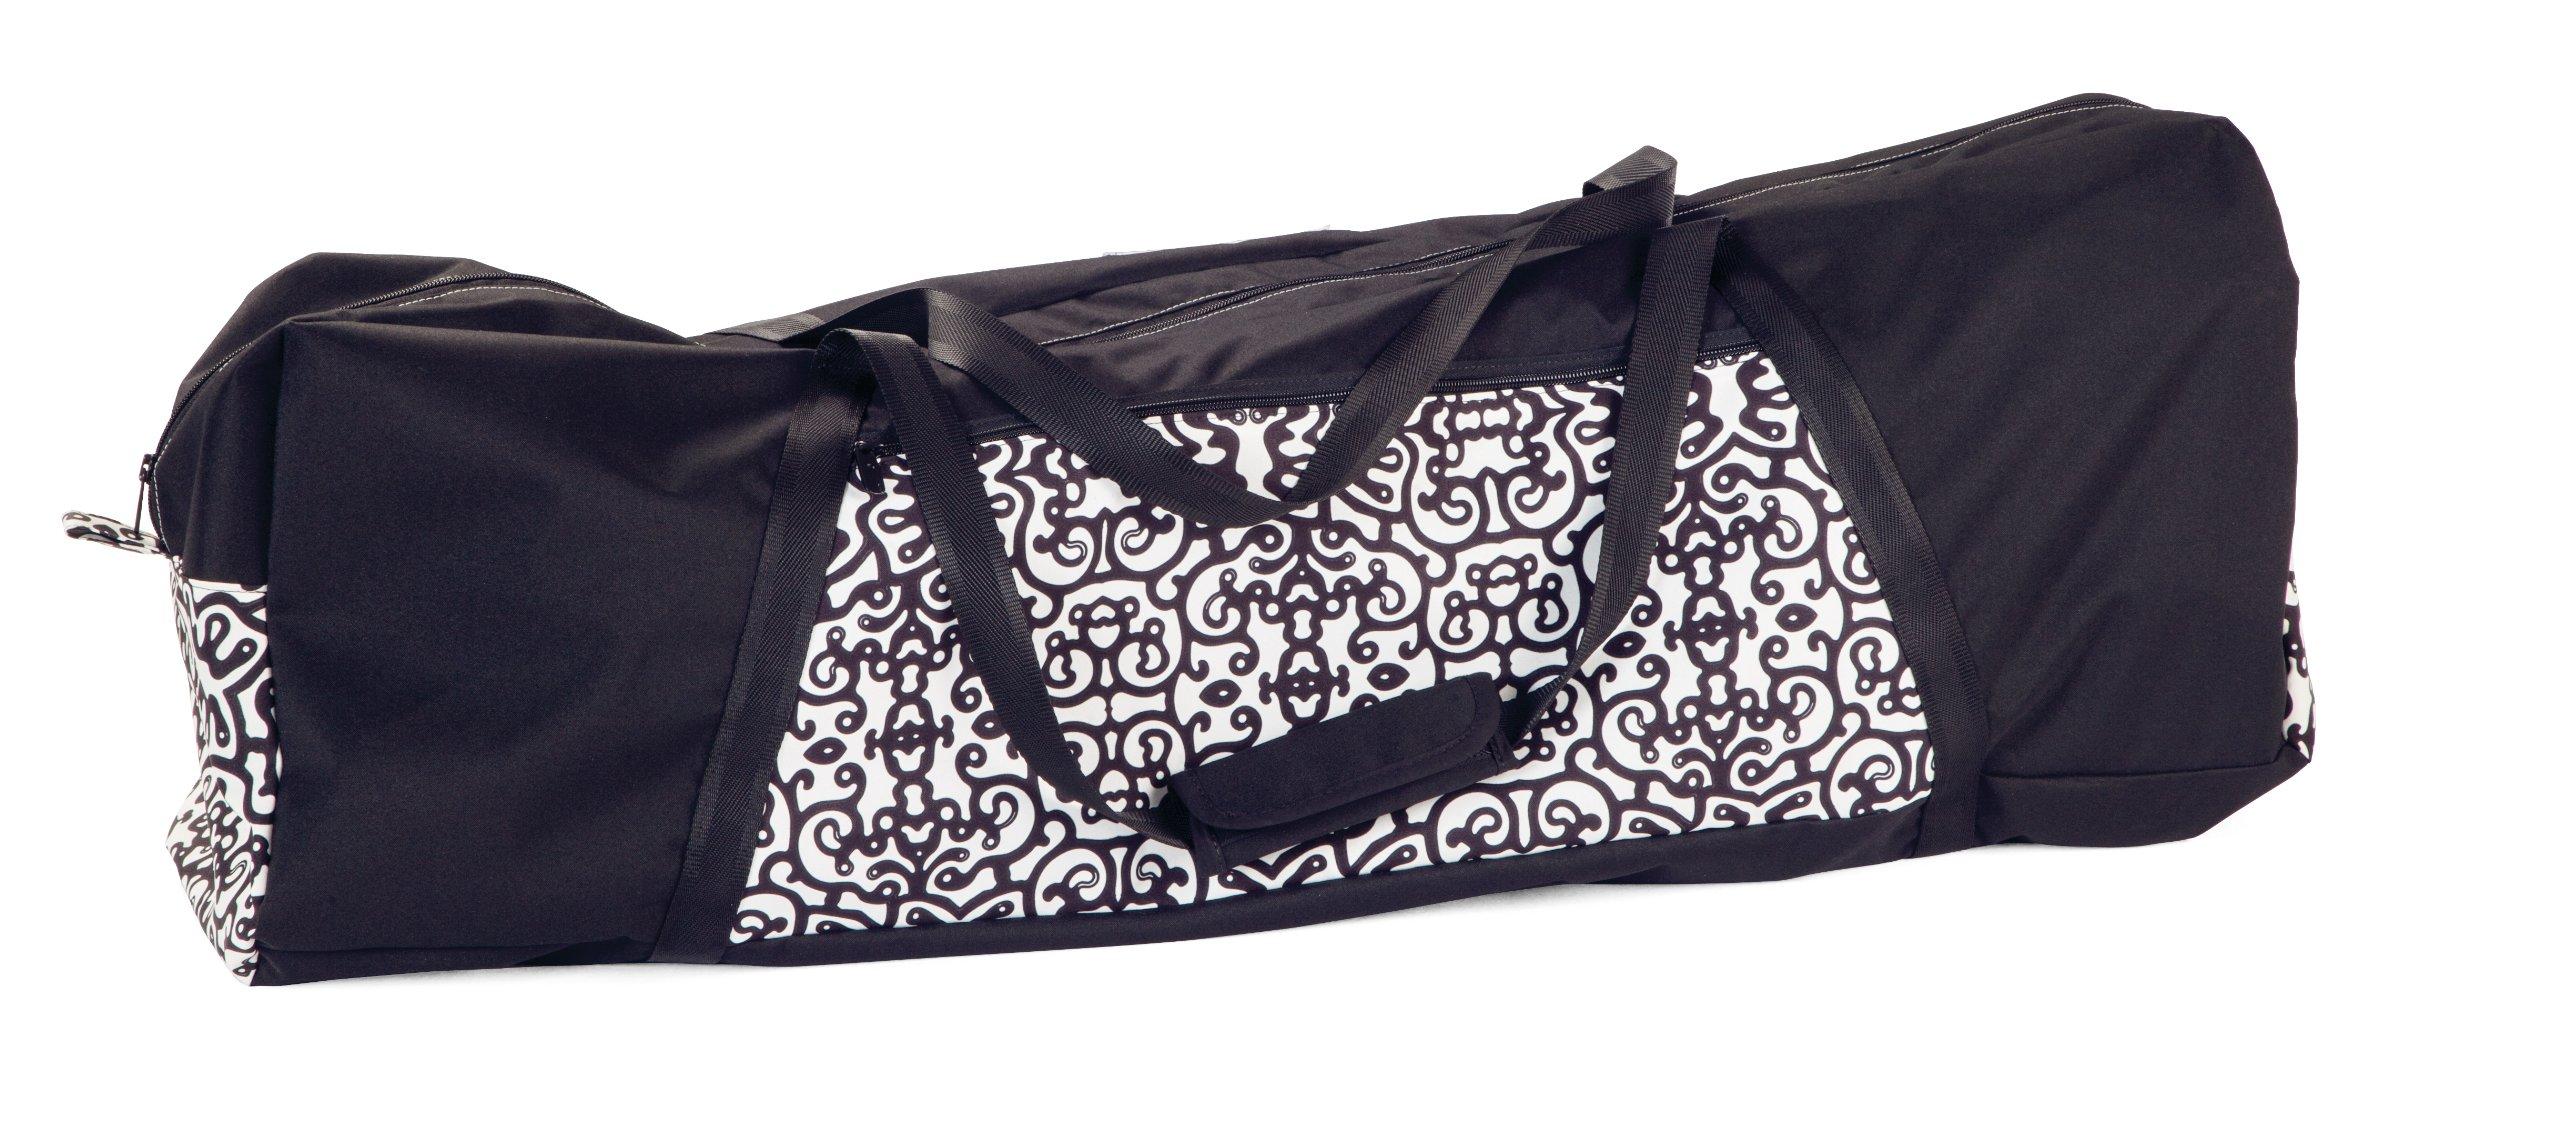 Peg Perego Pliko Mini Ghiro Travel Bag, Black/White by Peg Perego (Image #1)